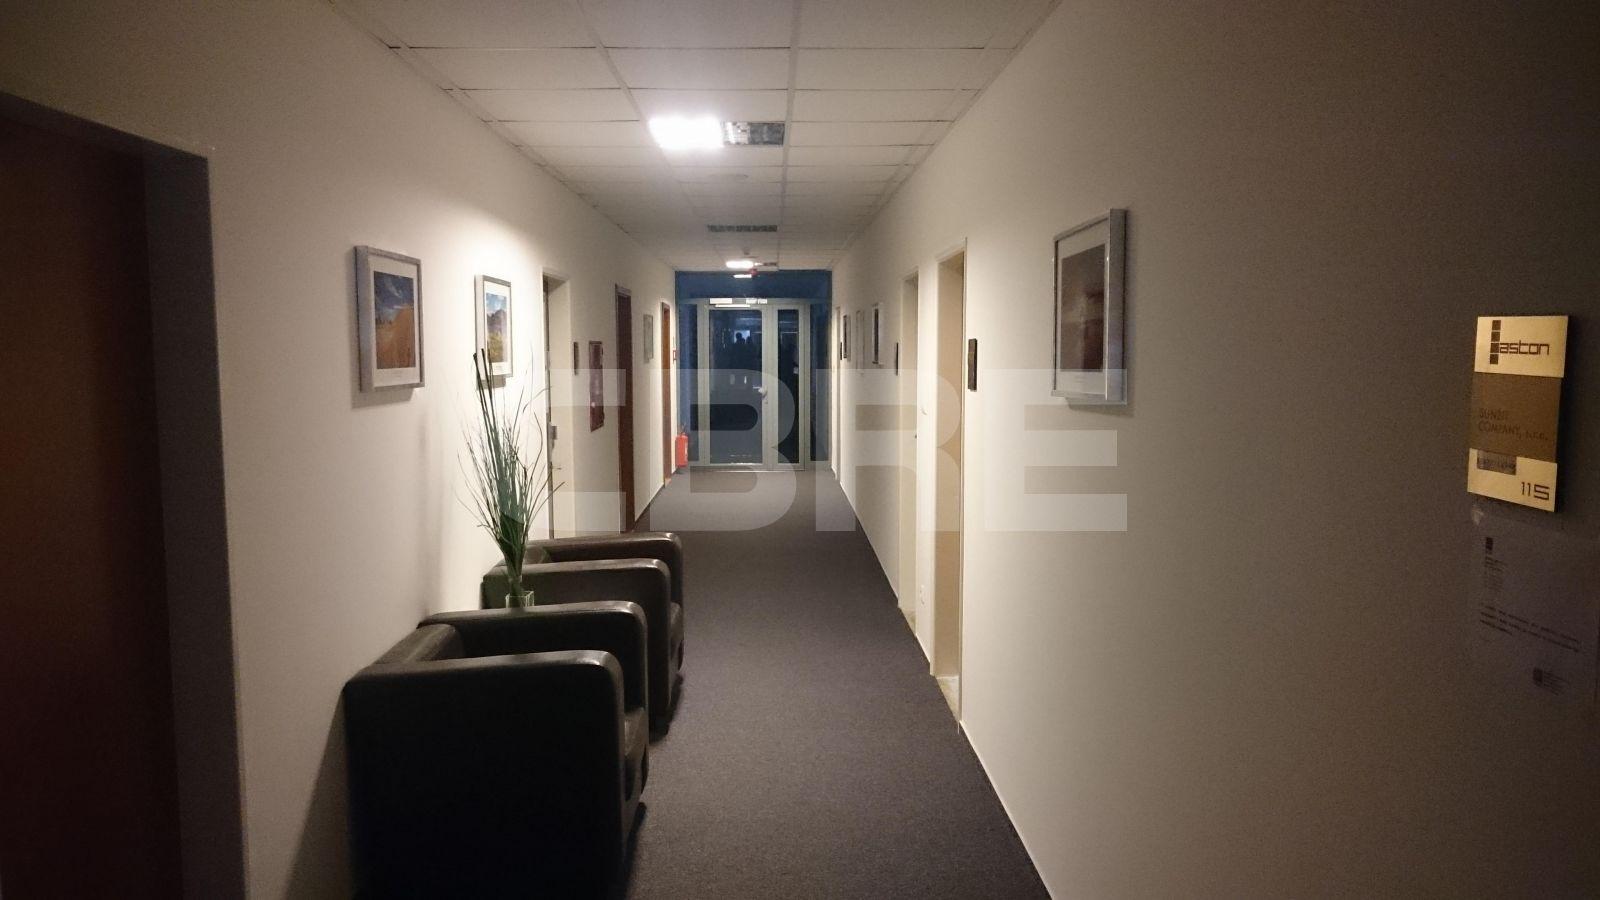 Aston - Bajkalská 22, Bratislava - Ružinov | Offices for rent by CBRE | 4